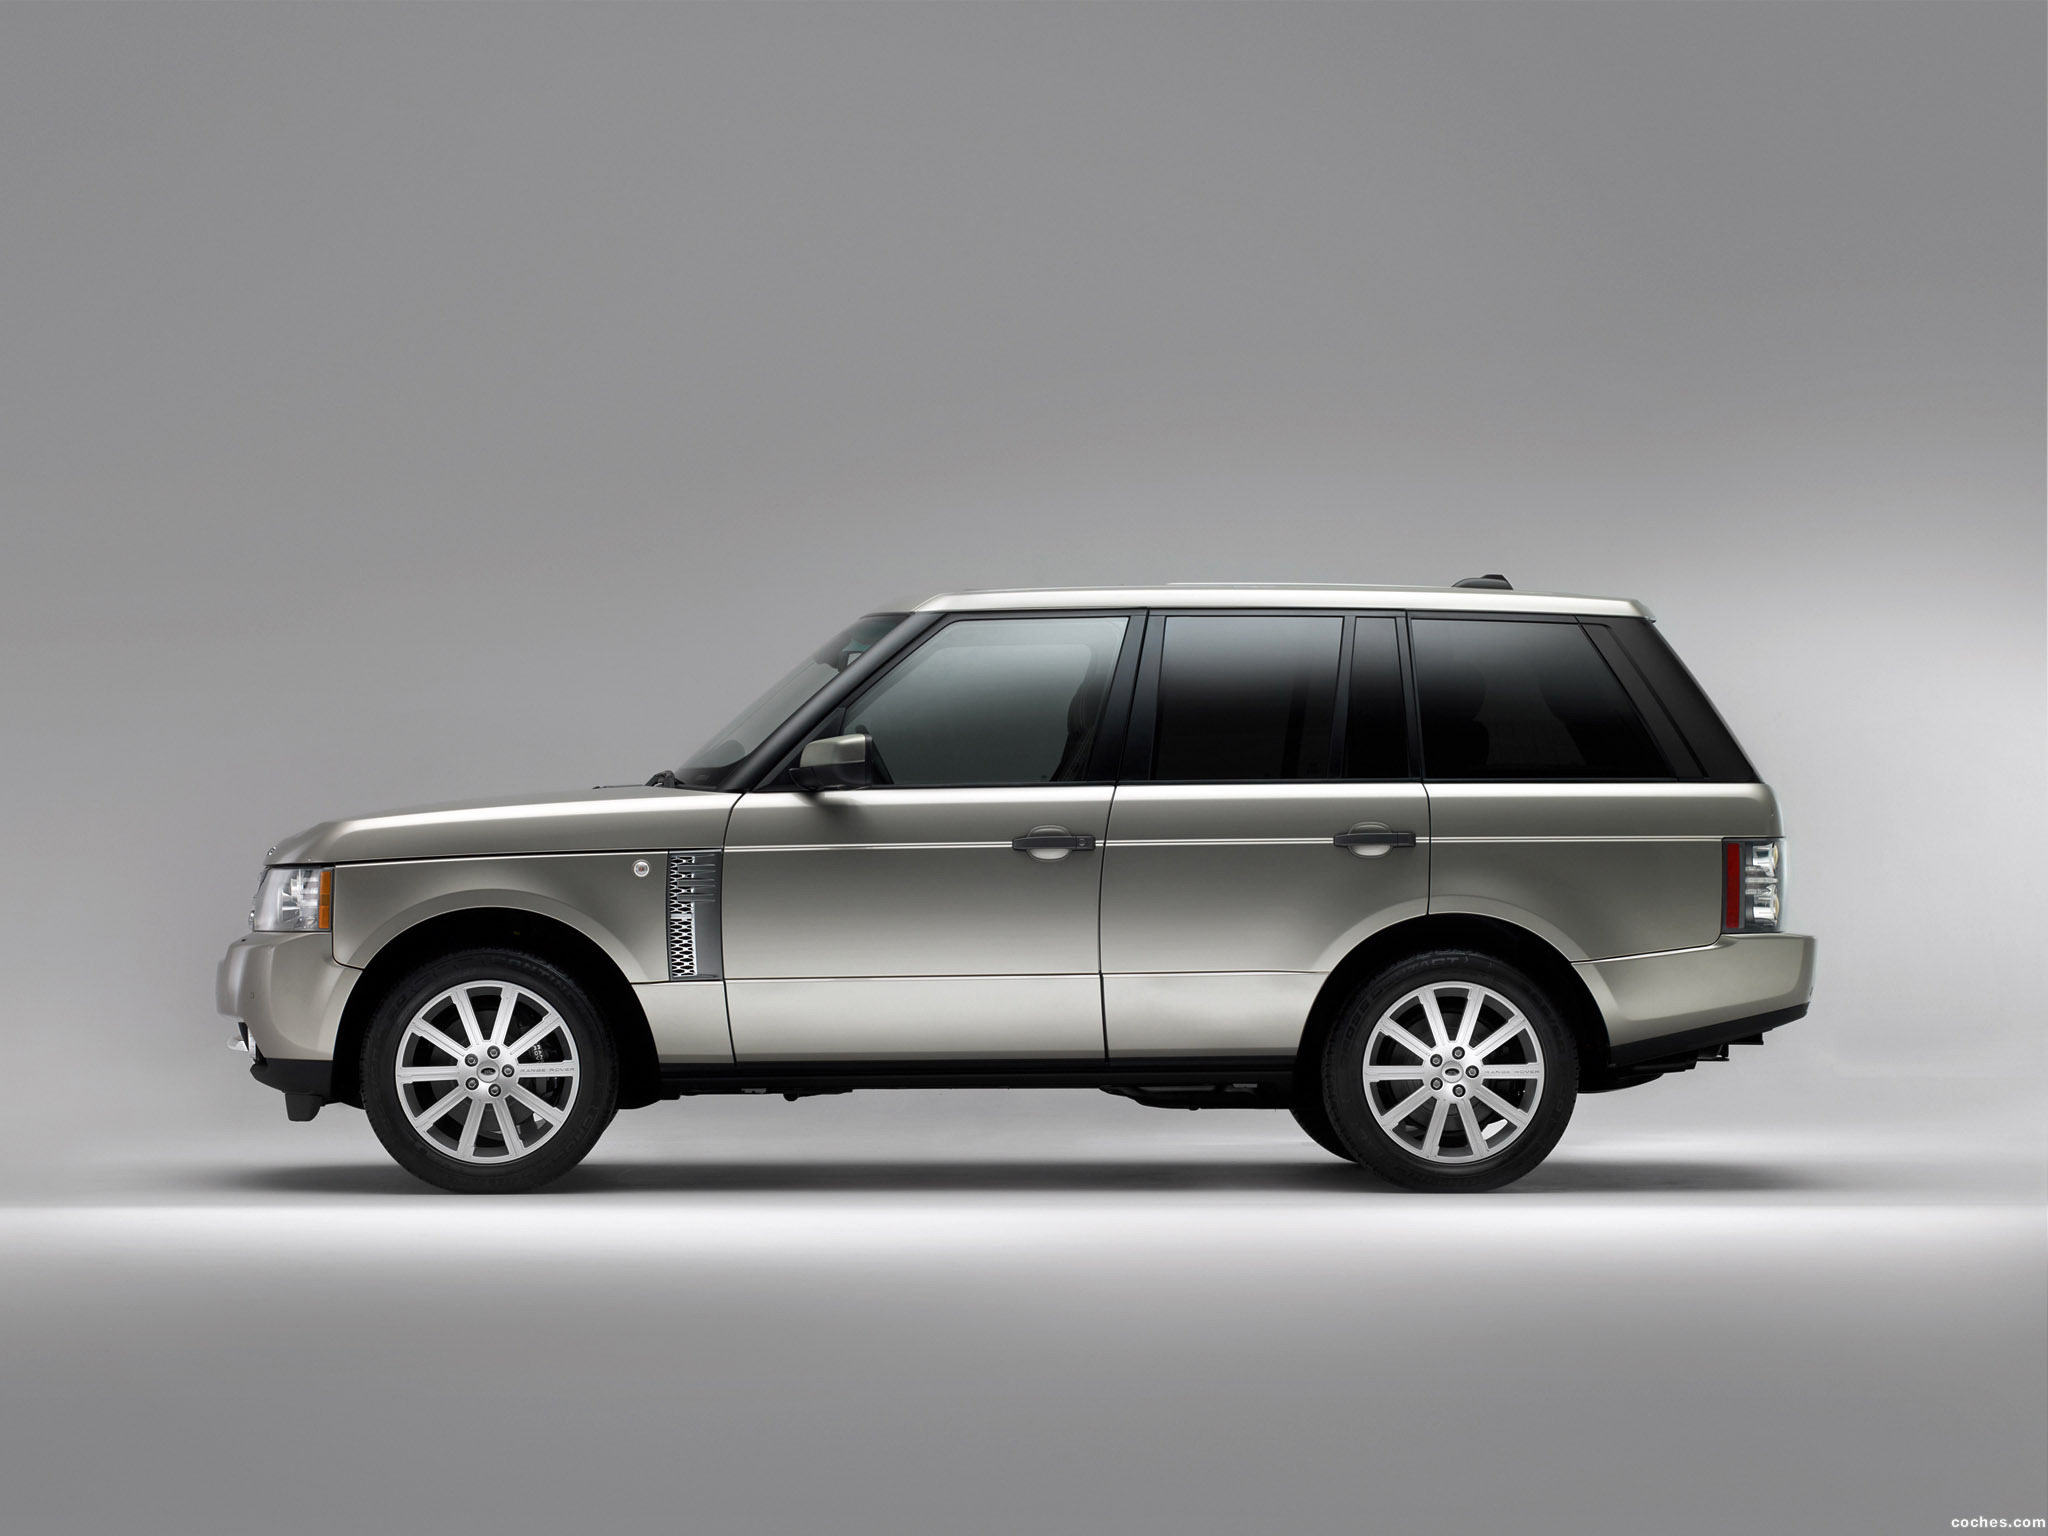 Foto 18 de Land Rover Range Rover (L322) 2009